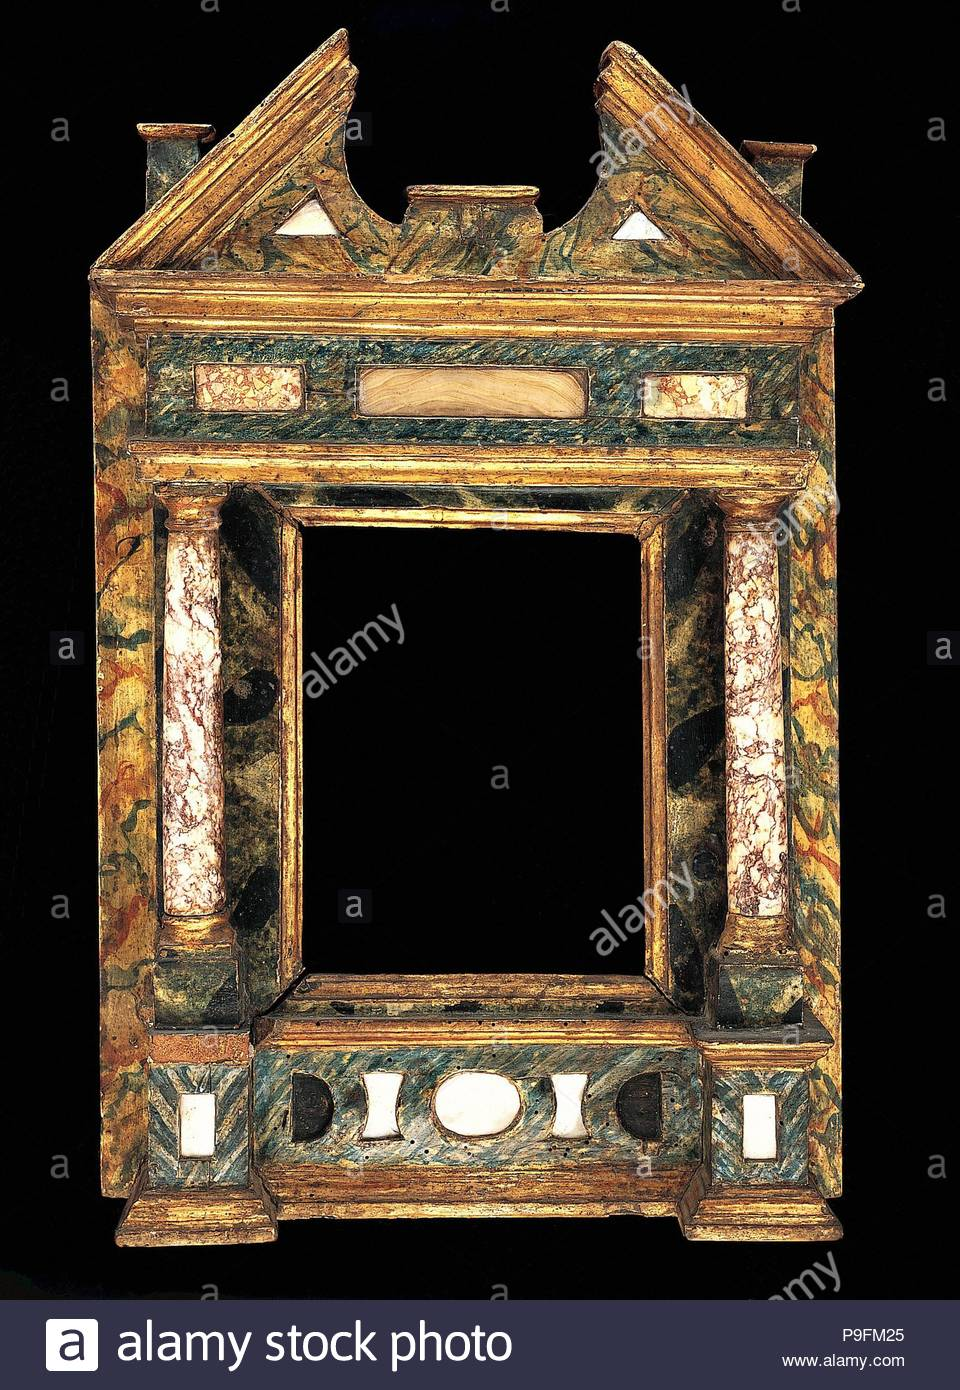 Wohnung Rahmen, Anfang des 17. Jahrhunderts, Italienisch, Venedig, Pappel, Perlmutt, Marmor, 46,4 x 29,8, 17,6 x 13,5, 19 x 14,8 cm, Rahmen. Stockbild